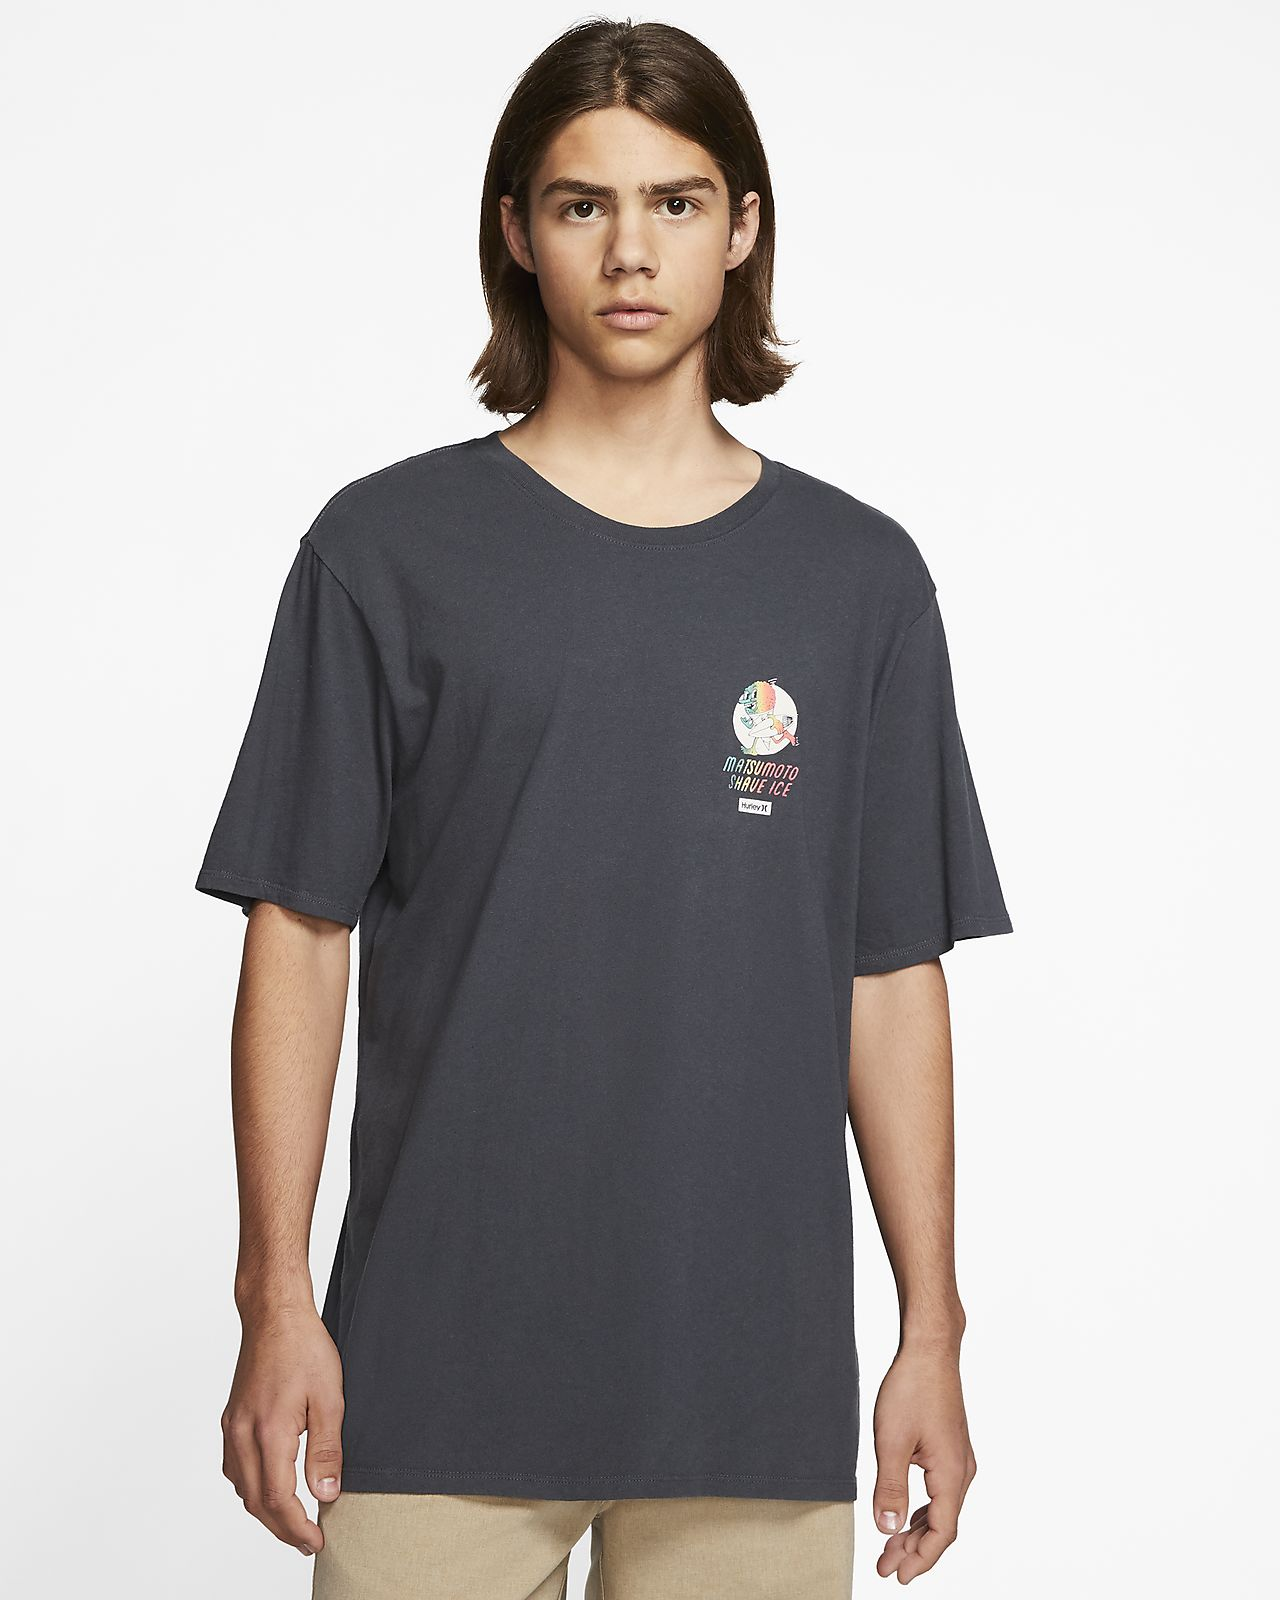 Hurley x Matsumoto Shave Ice T-skjorte til herre